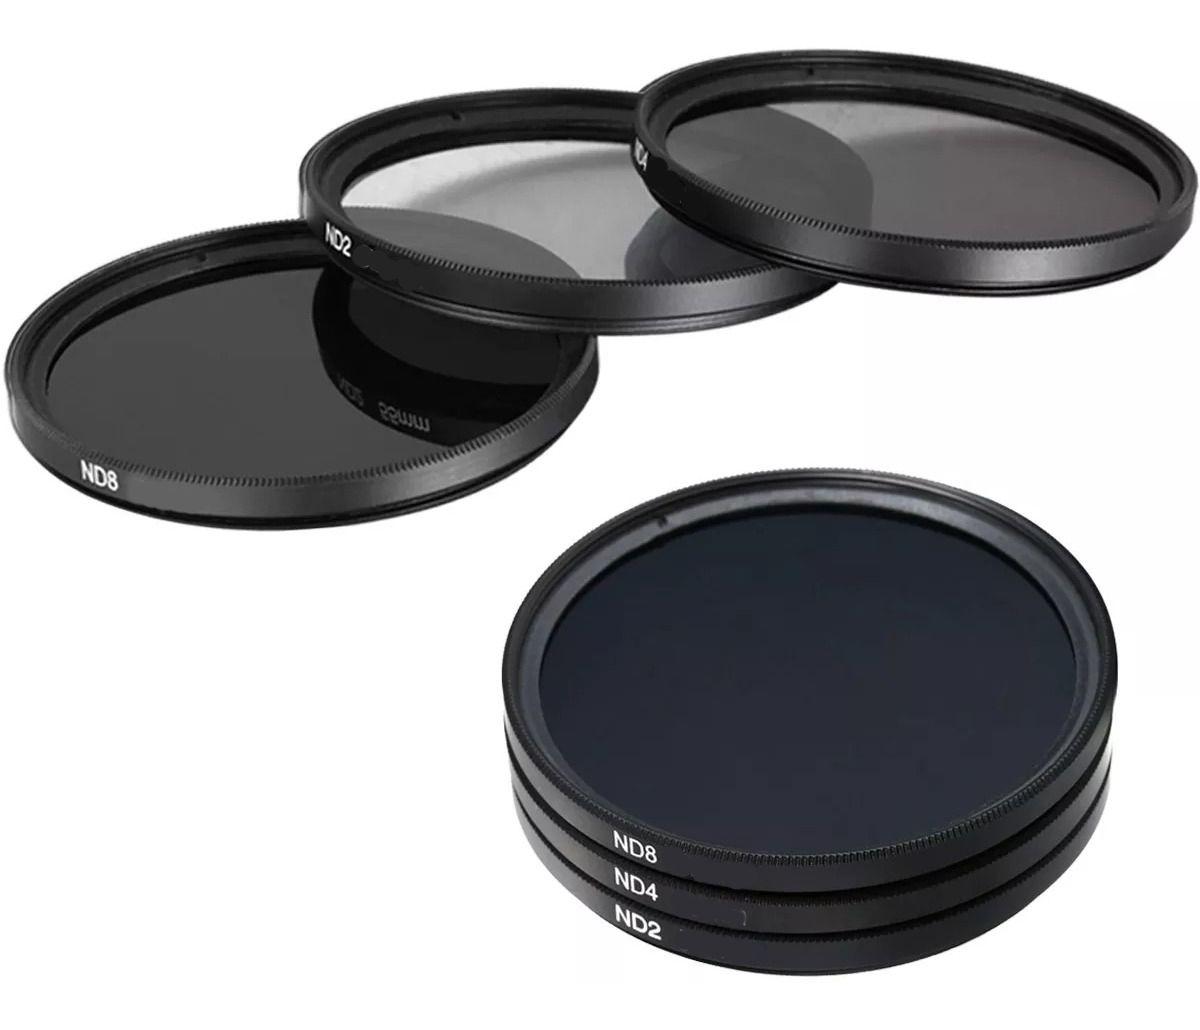 Kit De Filtro Nd2 + Nd4 + Nd8 + Case 82mm Nikon Sony Canon